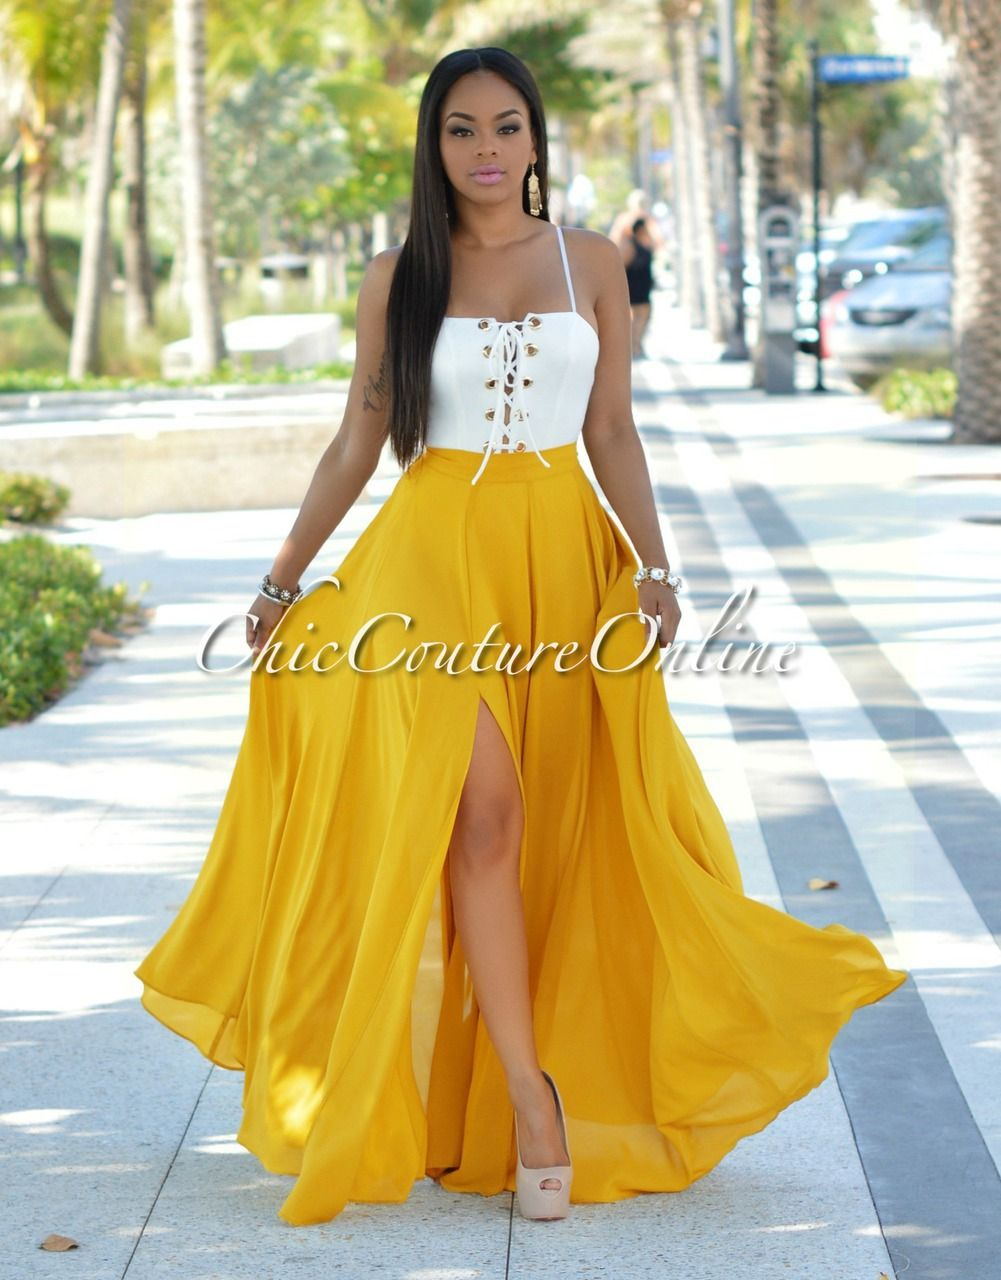 Caribbean queen white dress